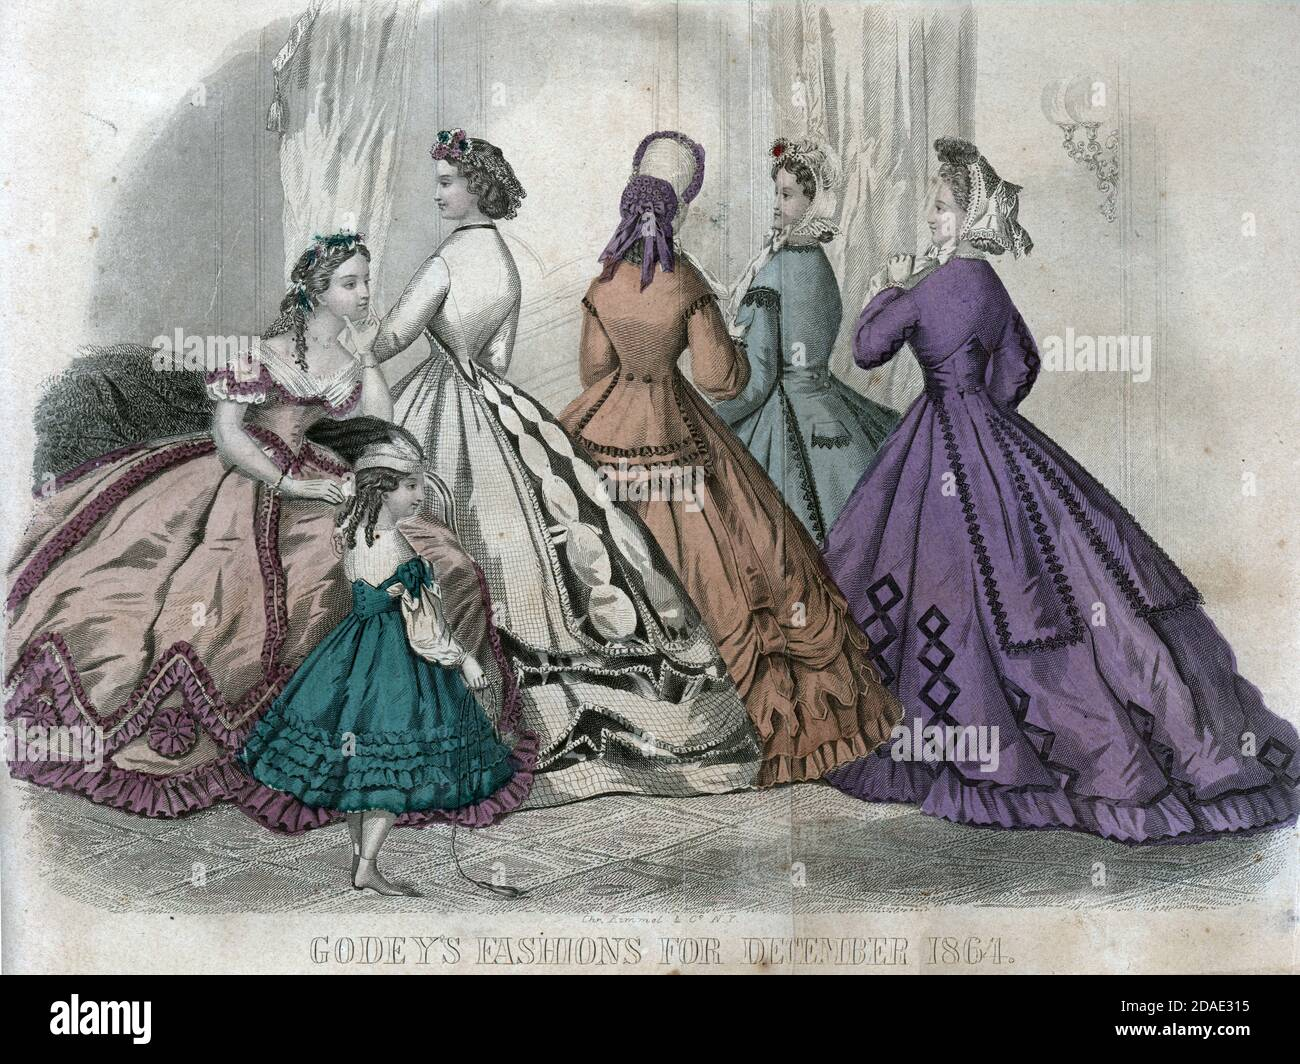 Godey's Fashion per dicembre 1864 da Godey's Lady's Book and Magazine, dicembre 1864, Volume LXIX, (Volume 69), Philadelphia, Louis A. Godey, Sarah Josepha Hale, Foto Stock